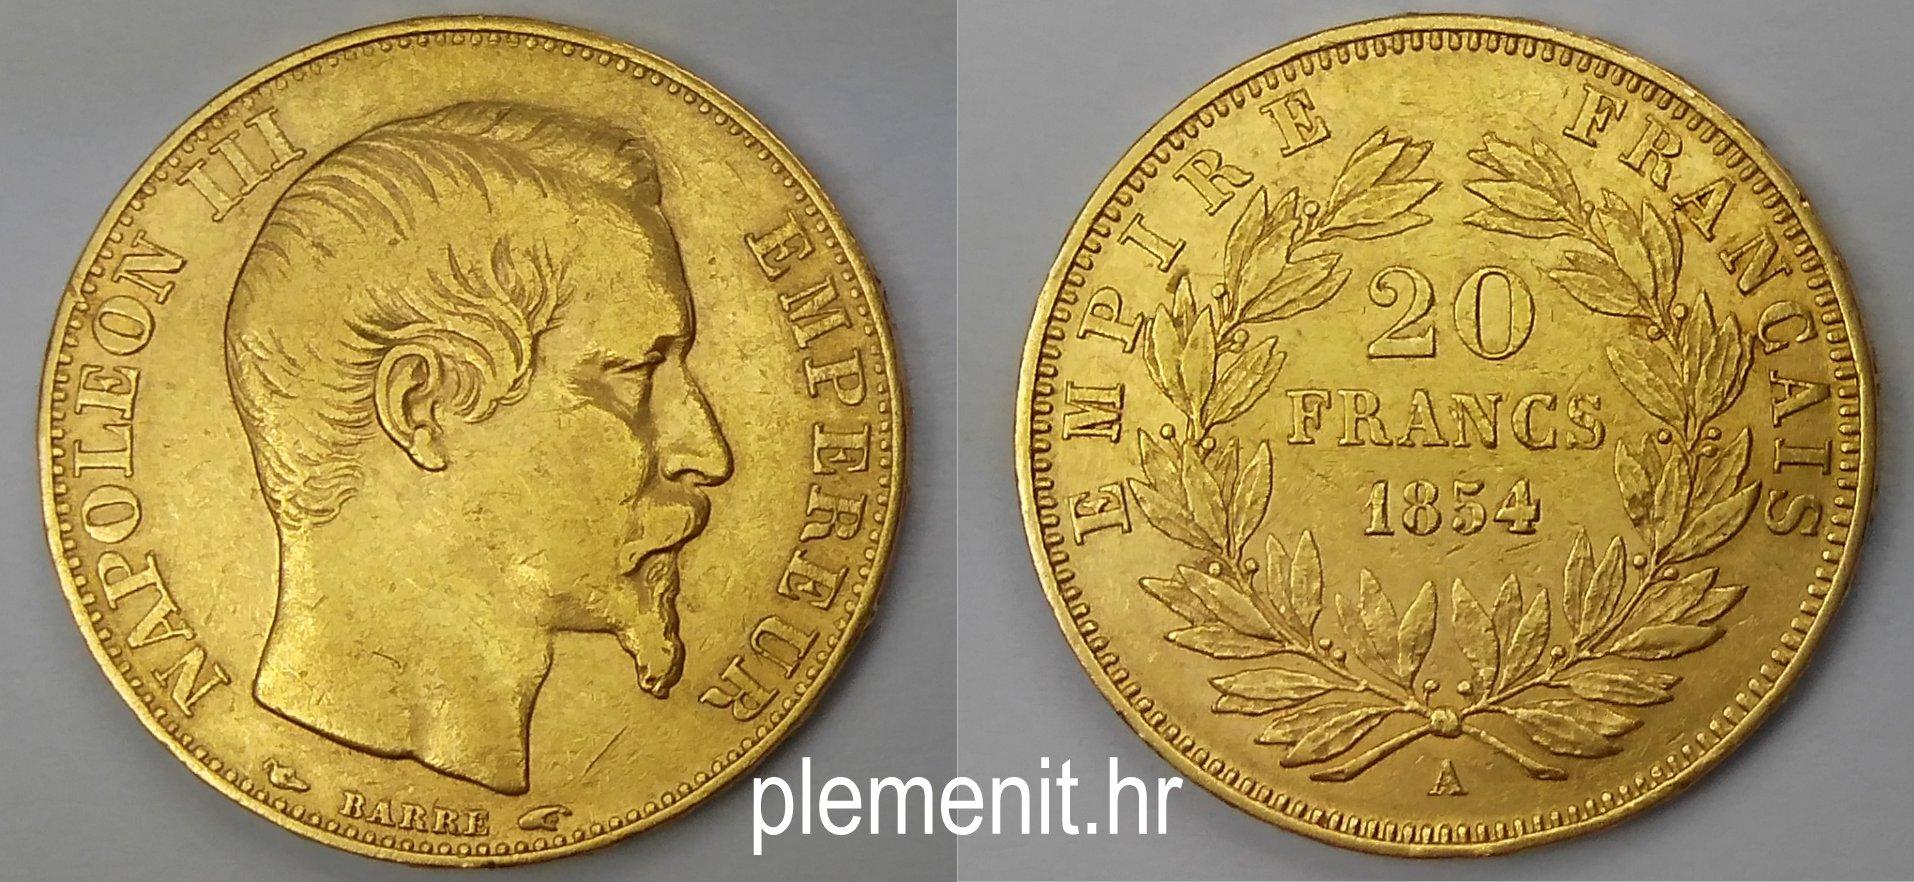 Zlatnik 20 franaka Napoleon III 1854 Francuska